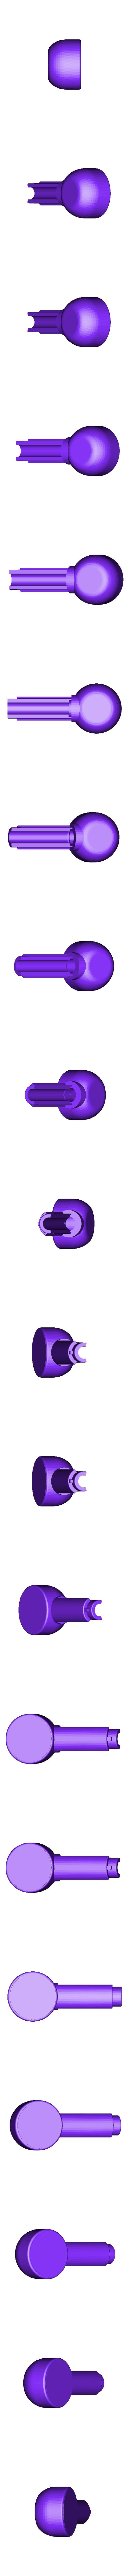 Hahnmain.stl Download free STL file faucet replacement kitchen • 3D printer design, AlbertKhan3D